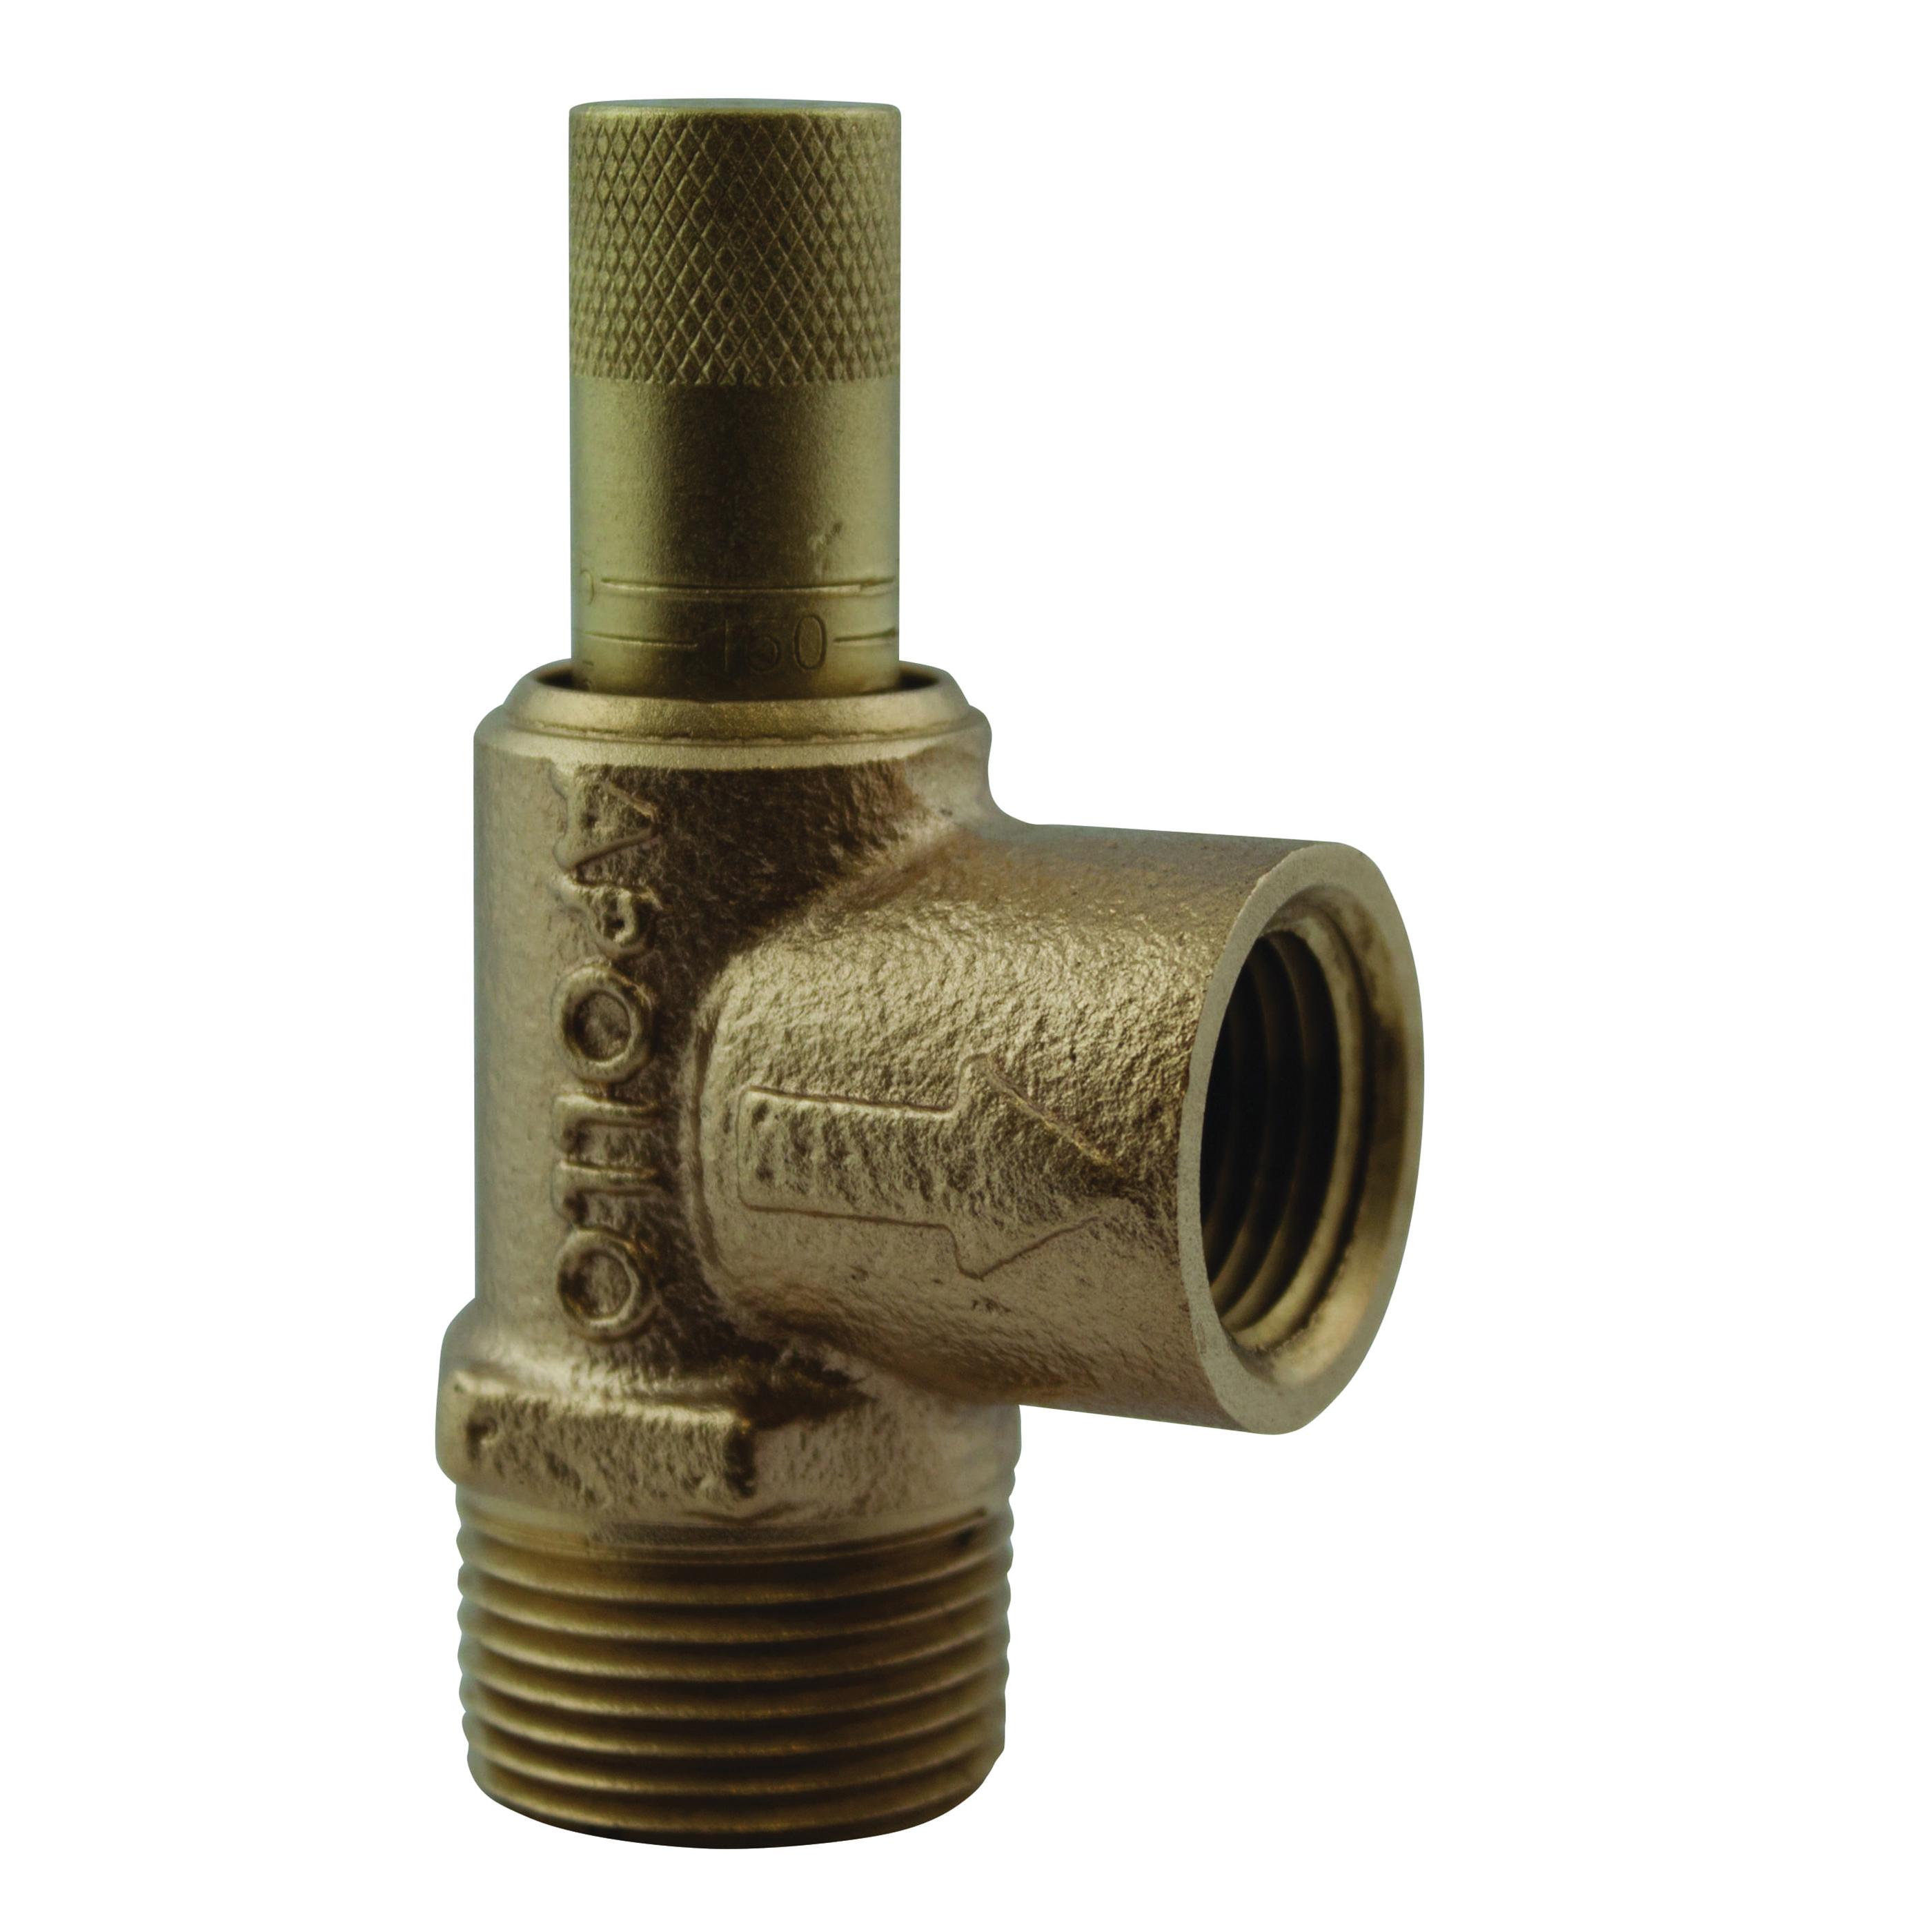 Apollo® 16-504-01 Cast Bronze Pressure Relief Valve, 3/4 in x 1/2 in, Male Inlet x Female Inlet, 50 - 175 psi, 200 deg F